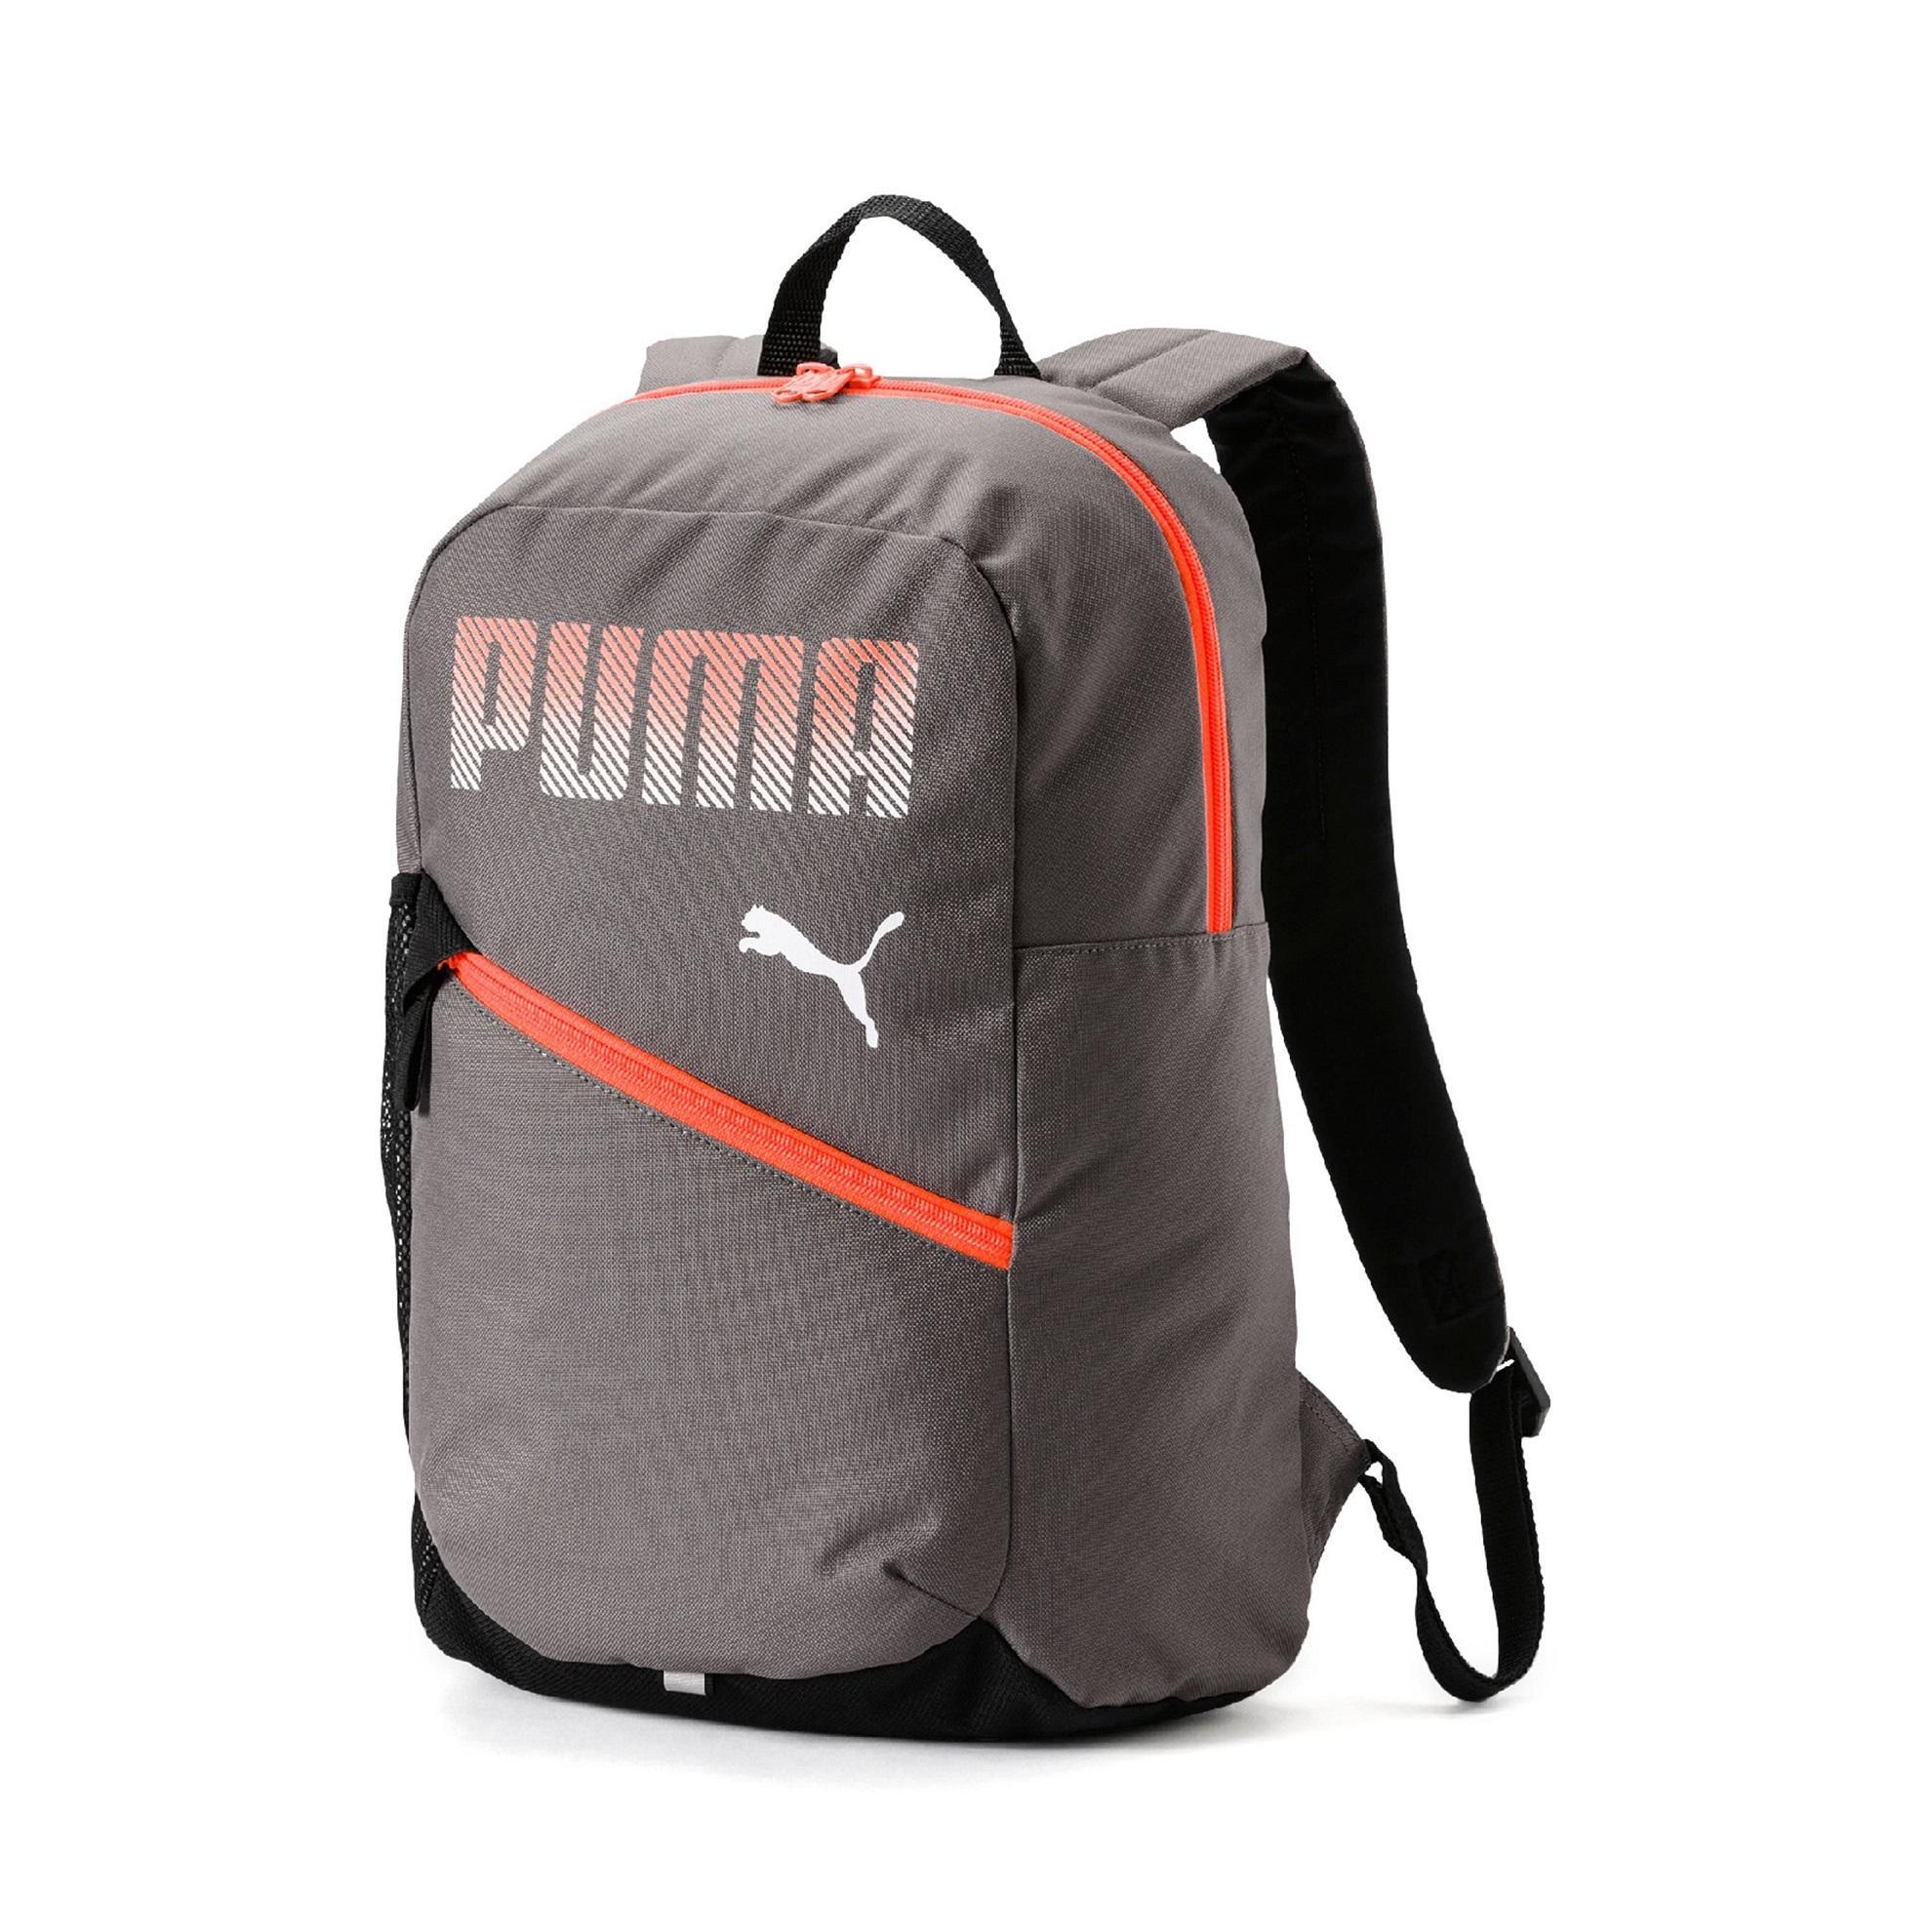 Persib 1933 Tas Laptop Backpack Blue Free Raincover Spec Dan Ransel Puma Plus 07548303 Abu